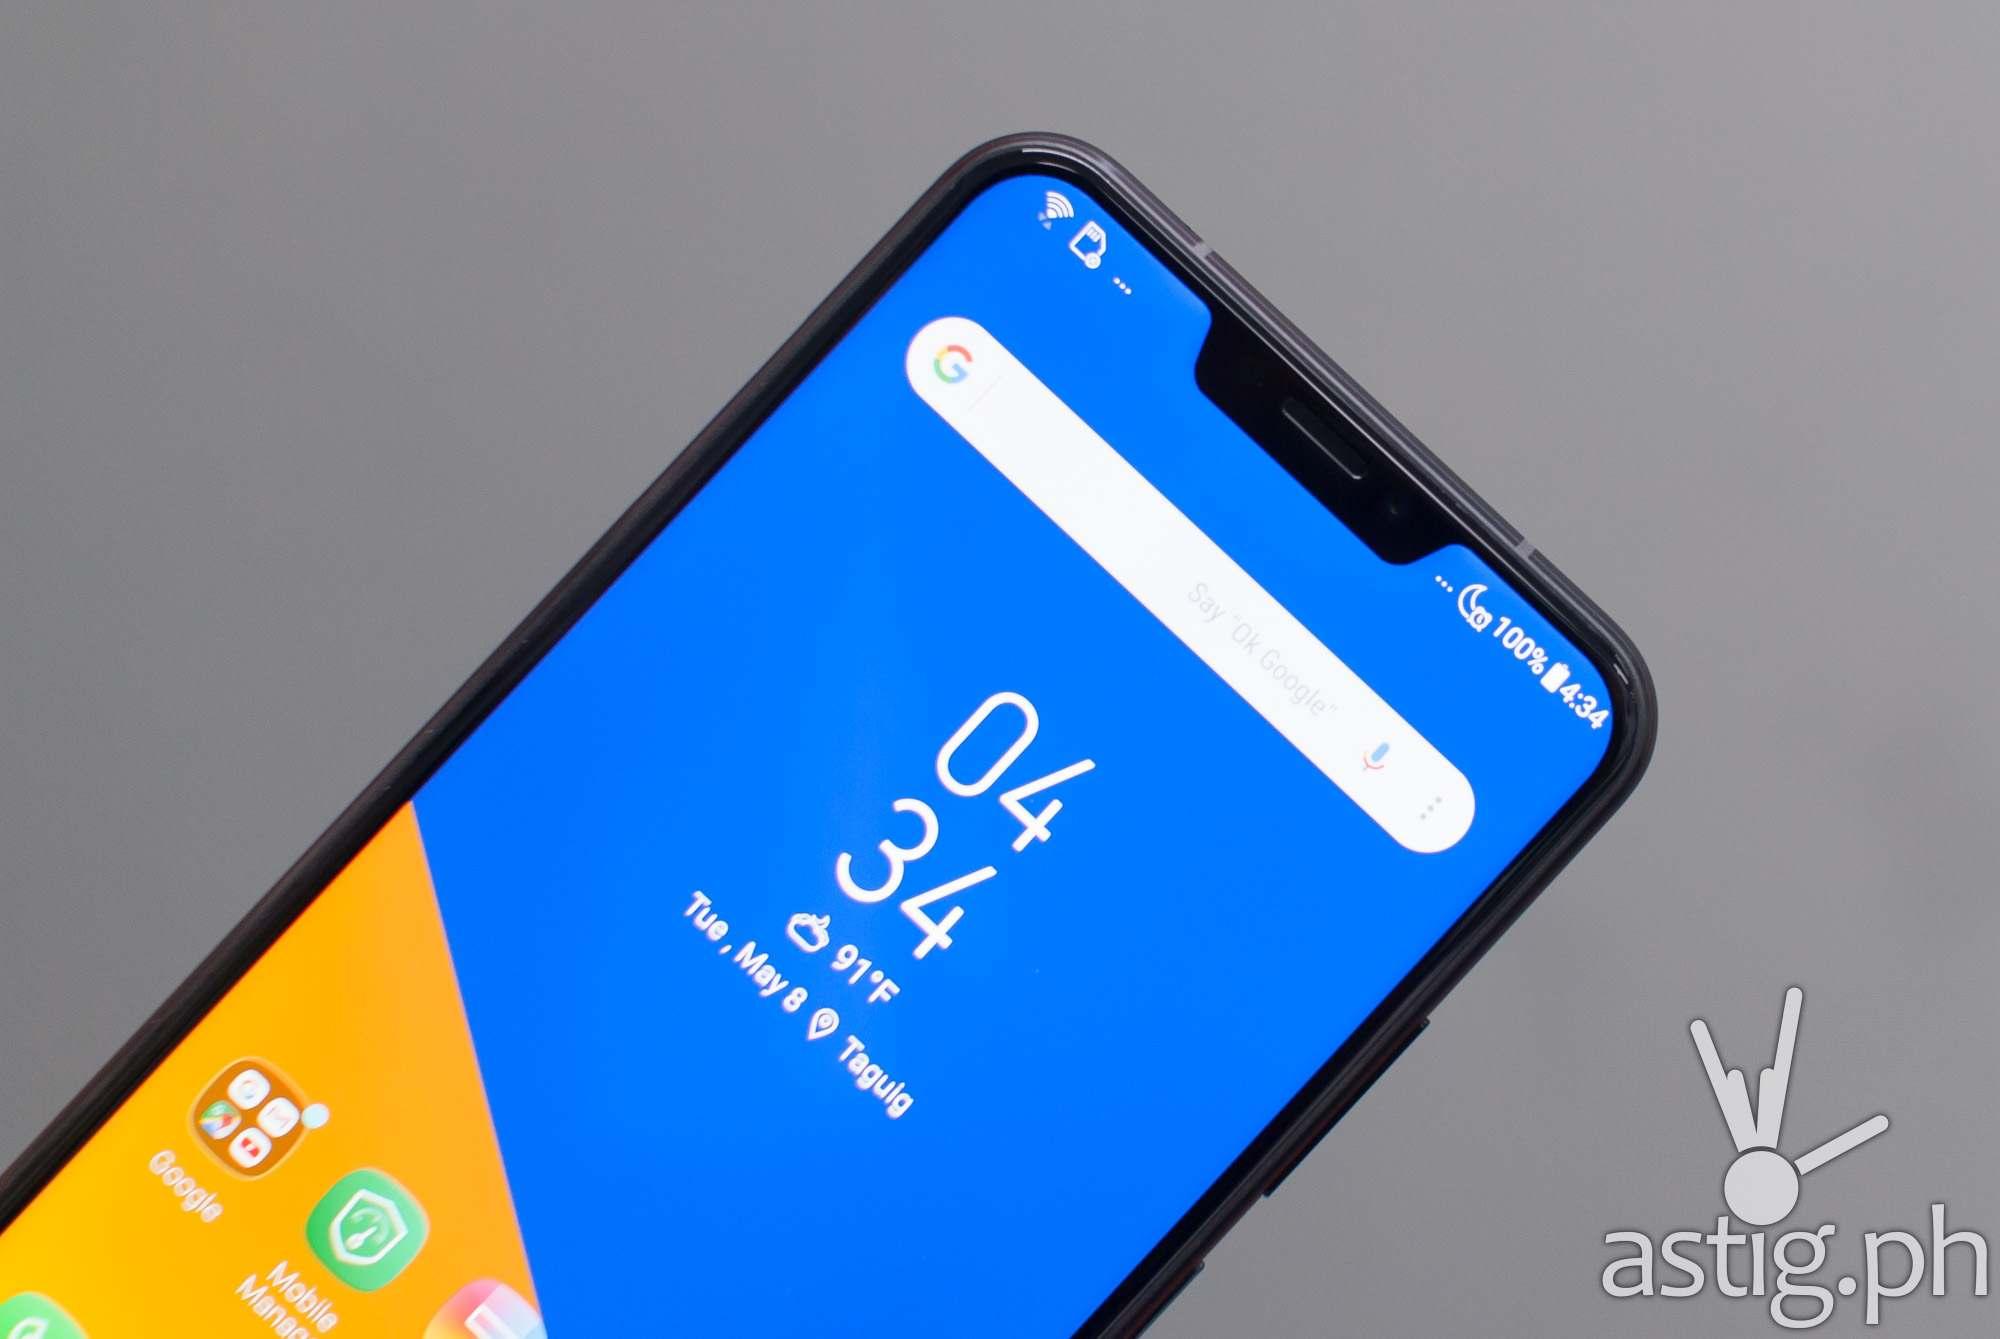 Zenfone 5 front - notch, selfie camera